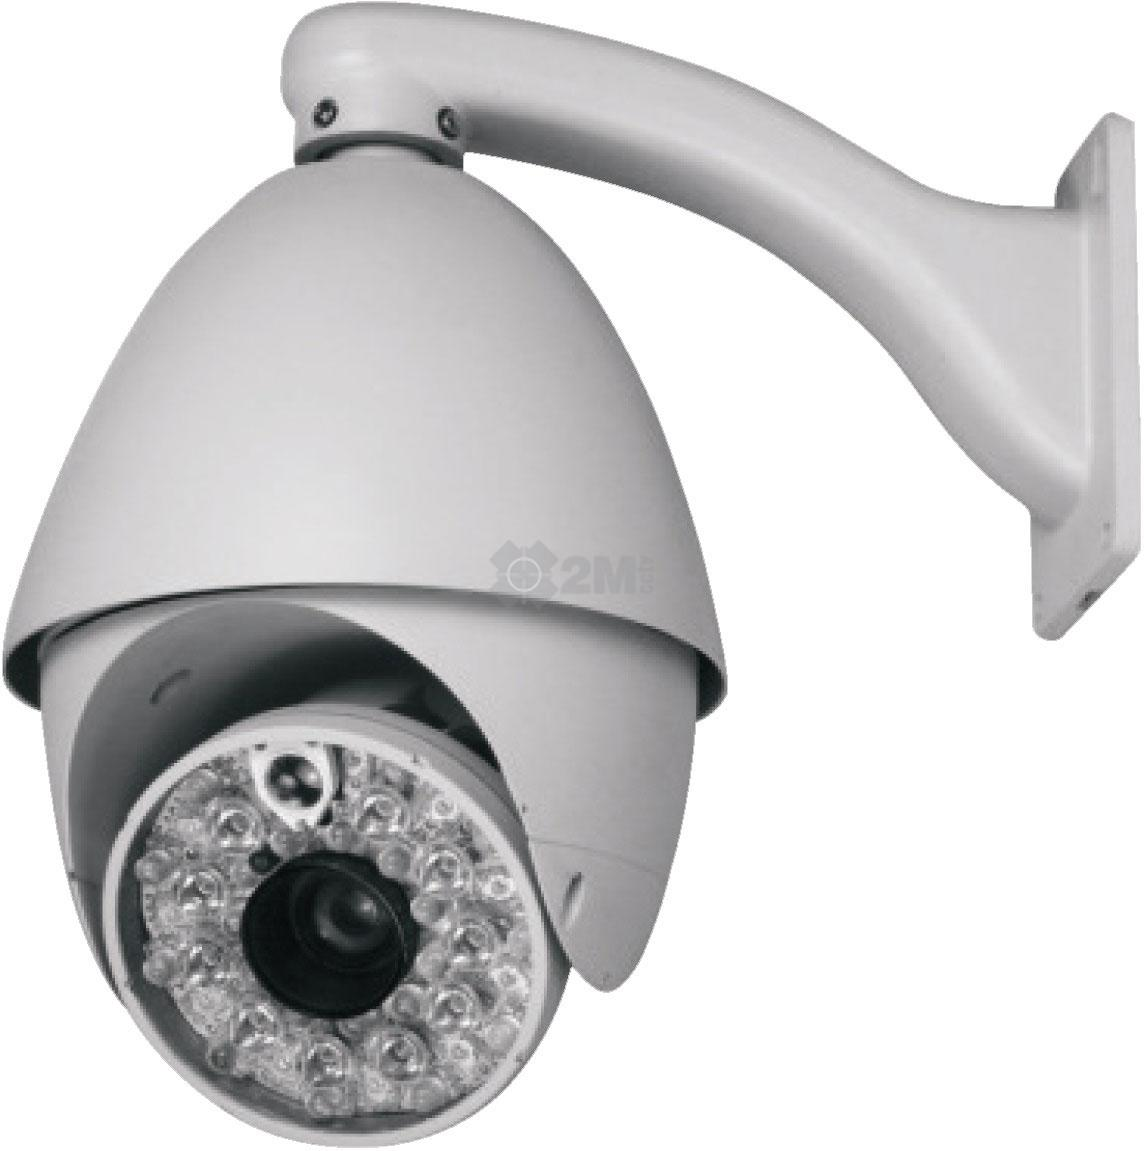 Copy of PTZ (Pan/Tilt/Zoom) Camera